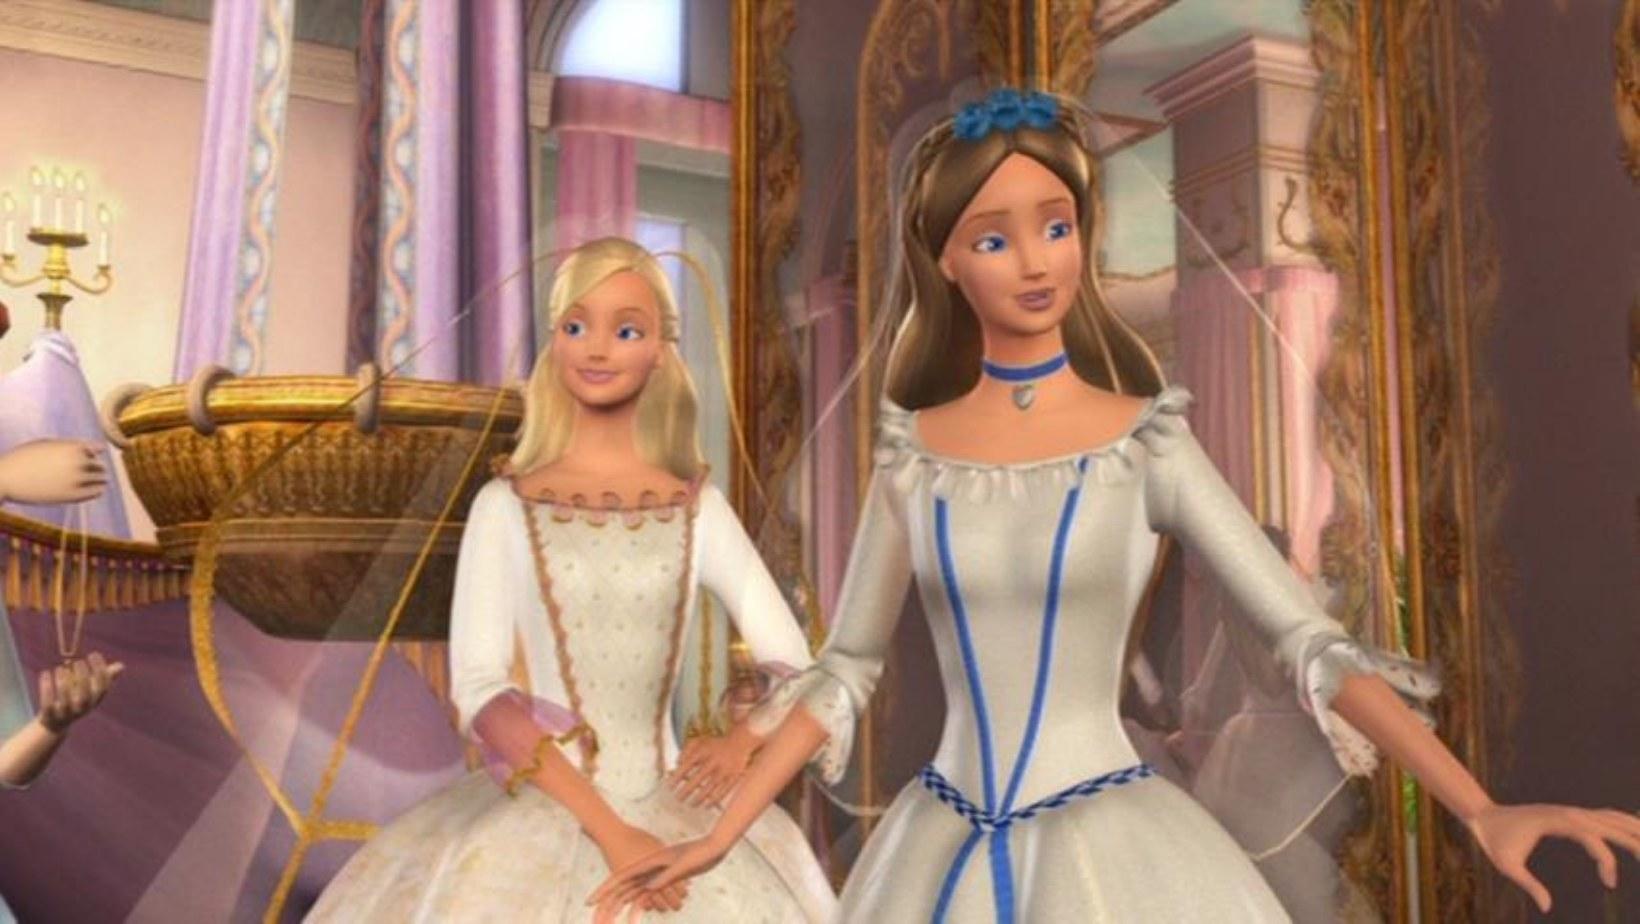 Anneliese and Erika wearing matching wedding dress